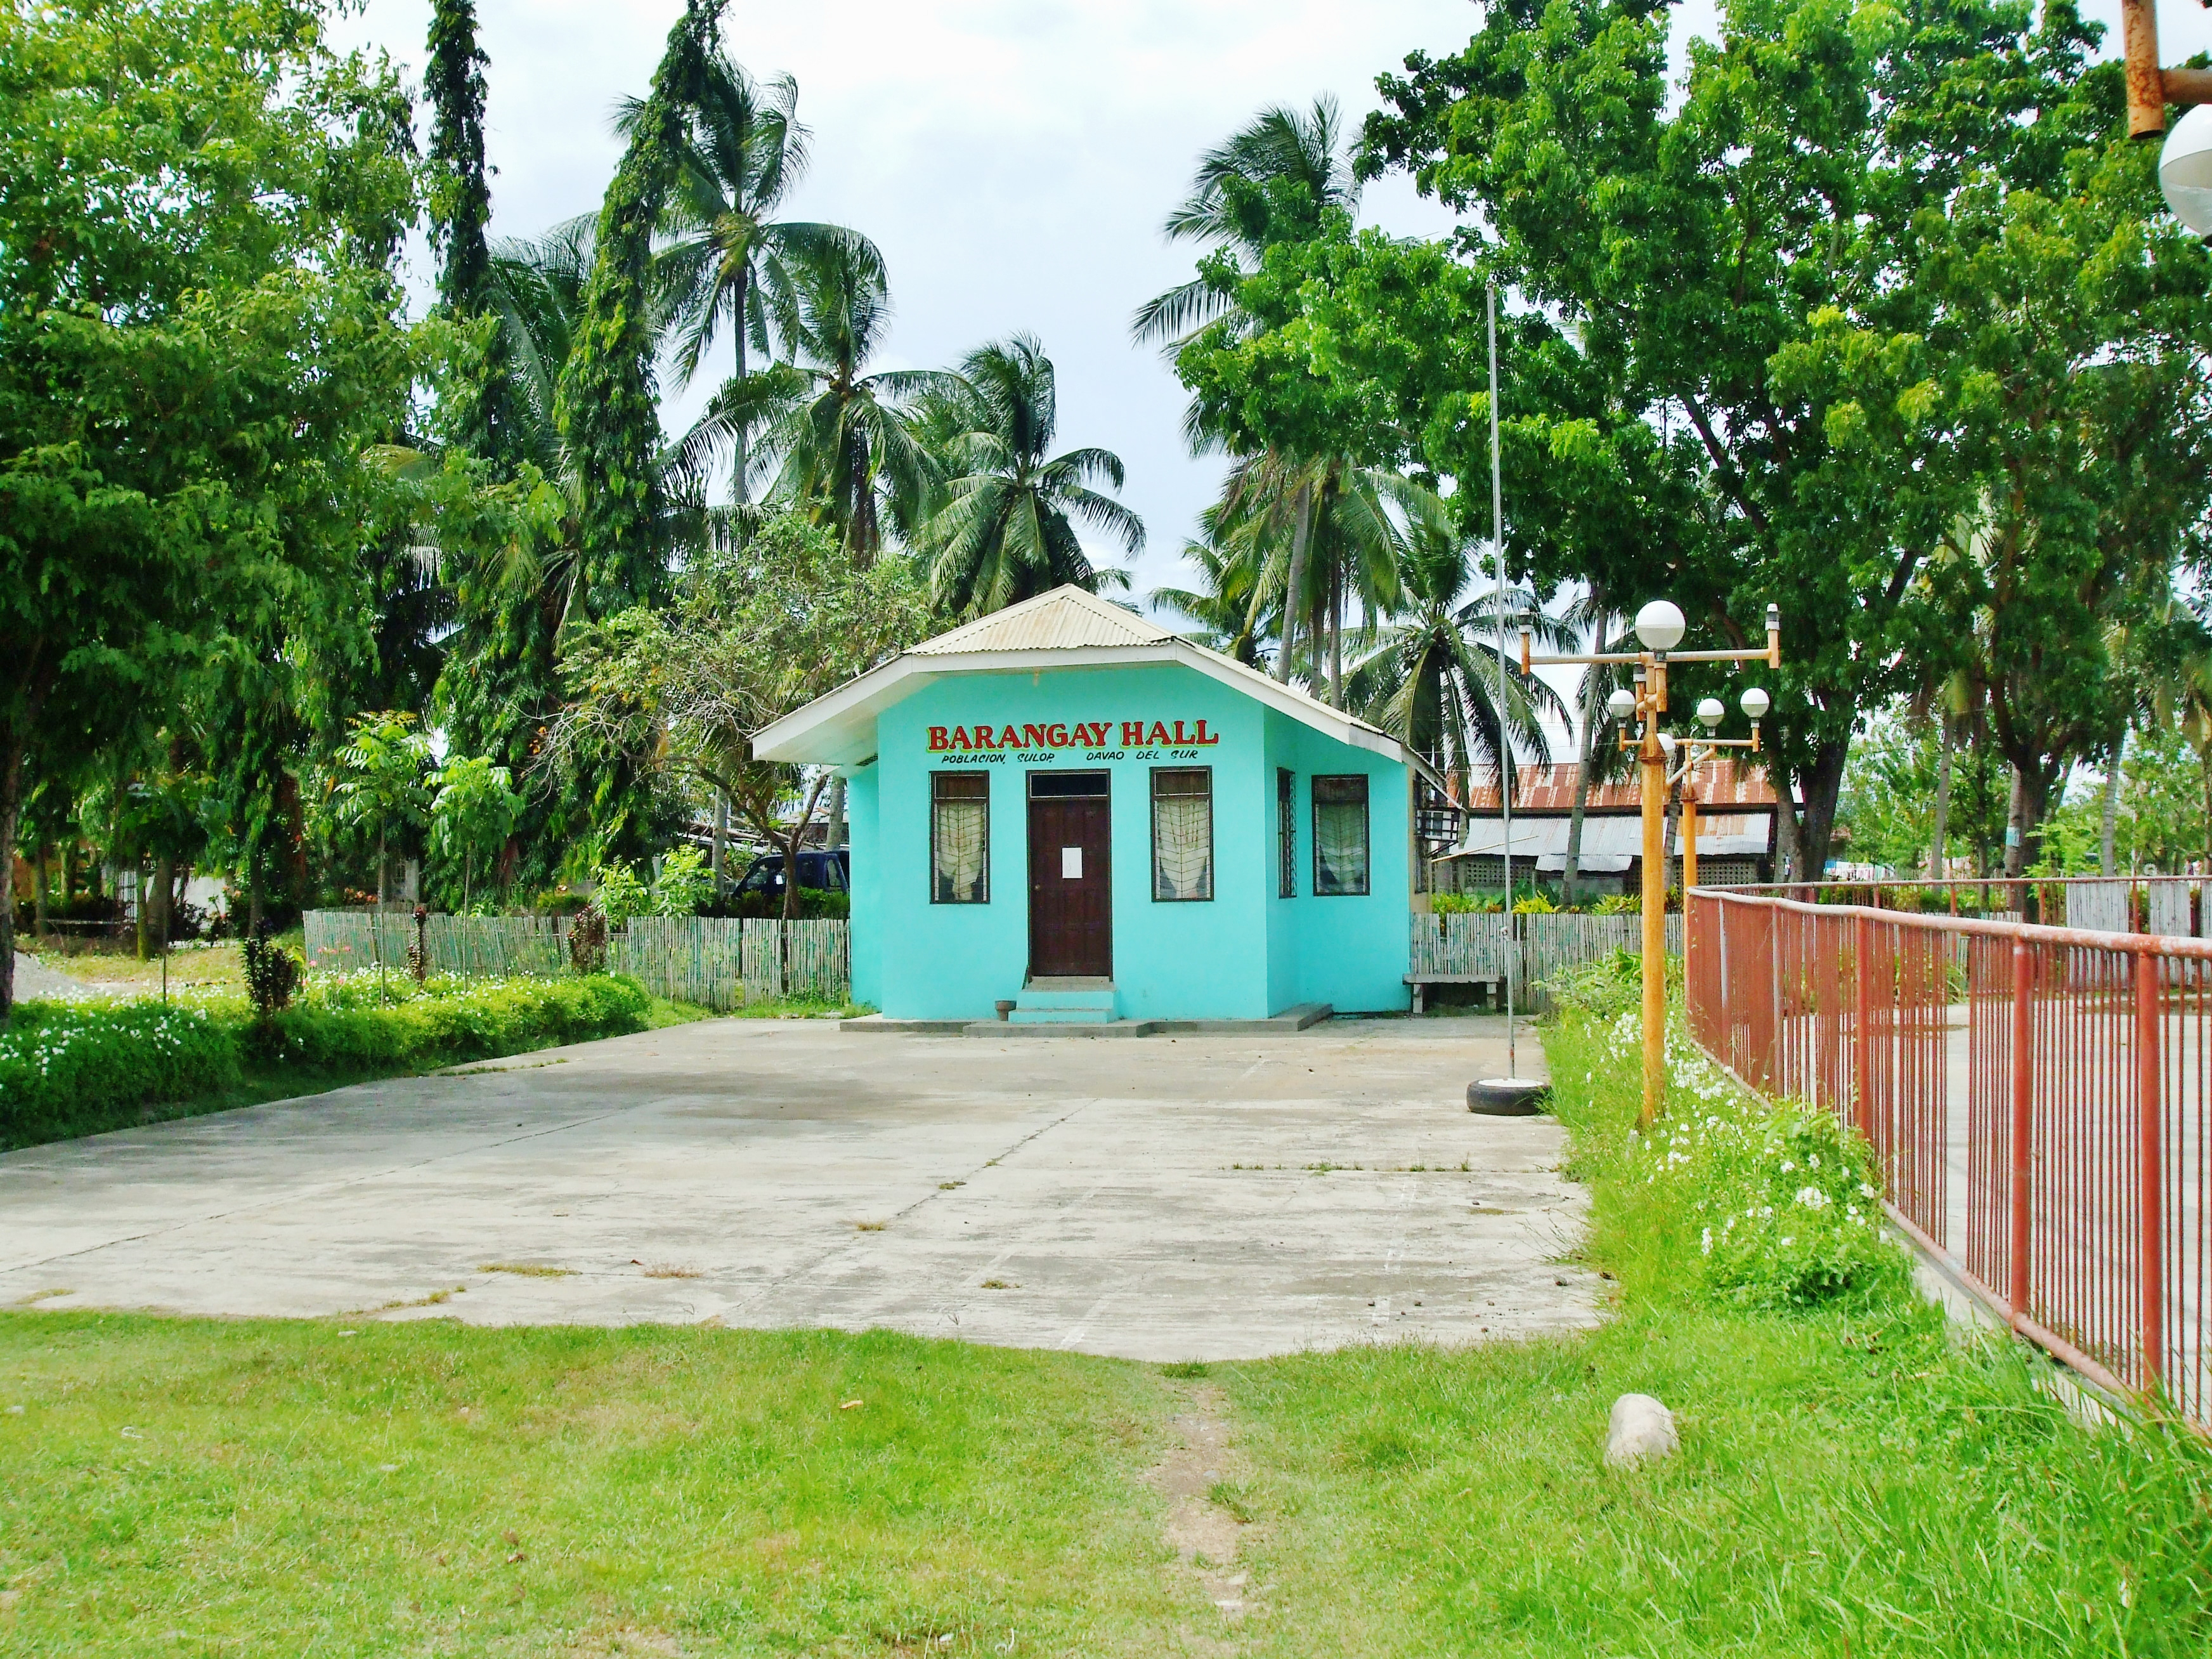 Town clipart barangay hall #9